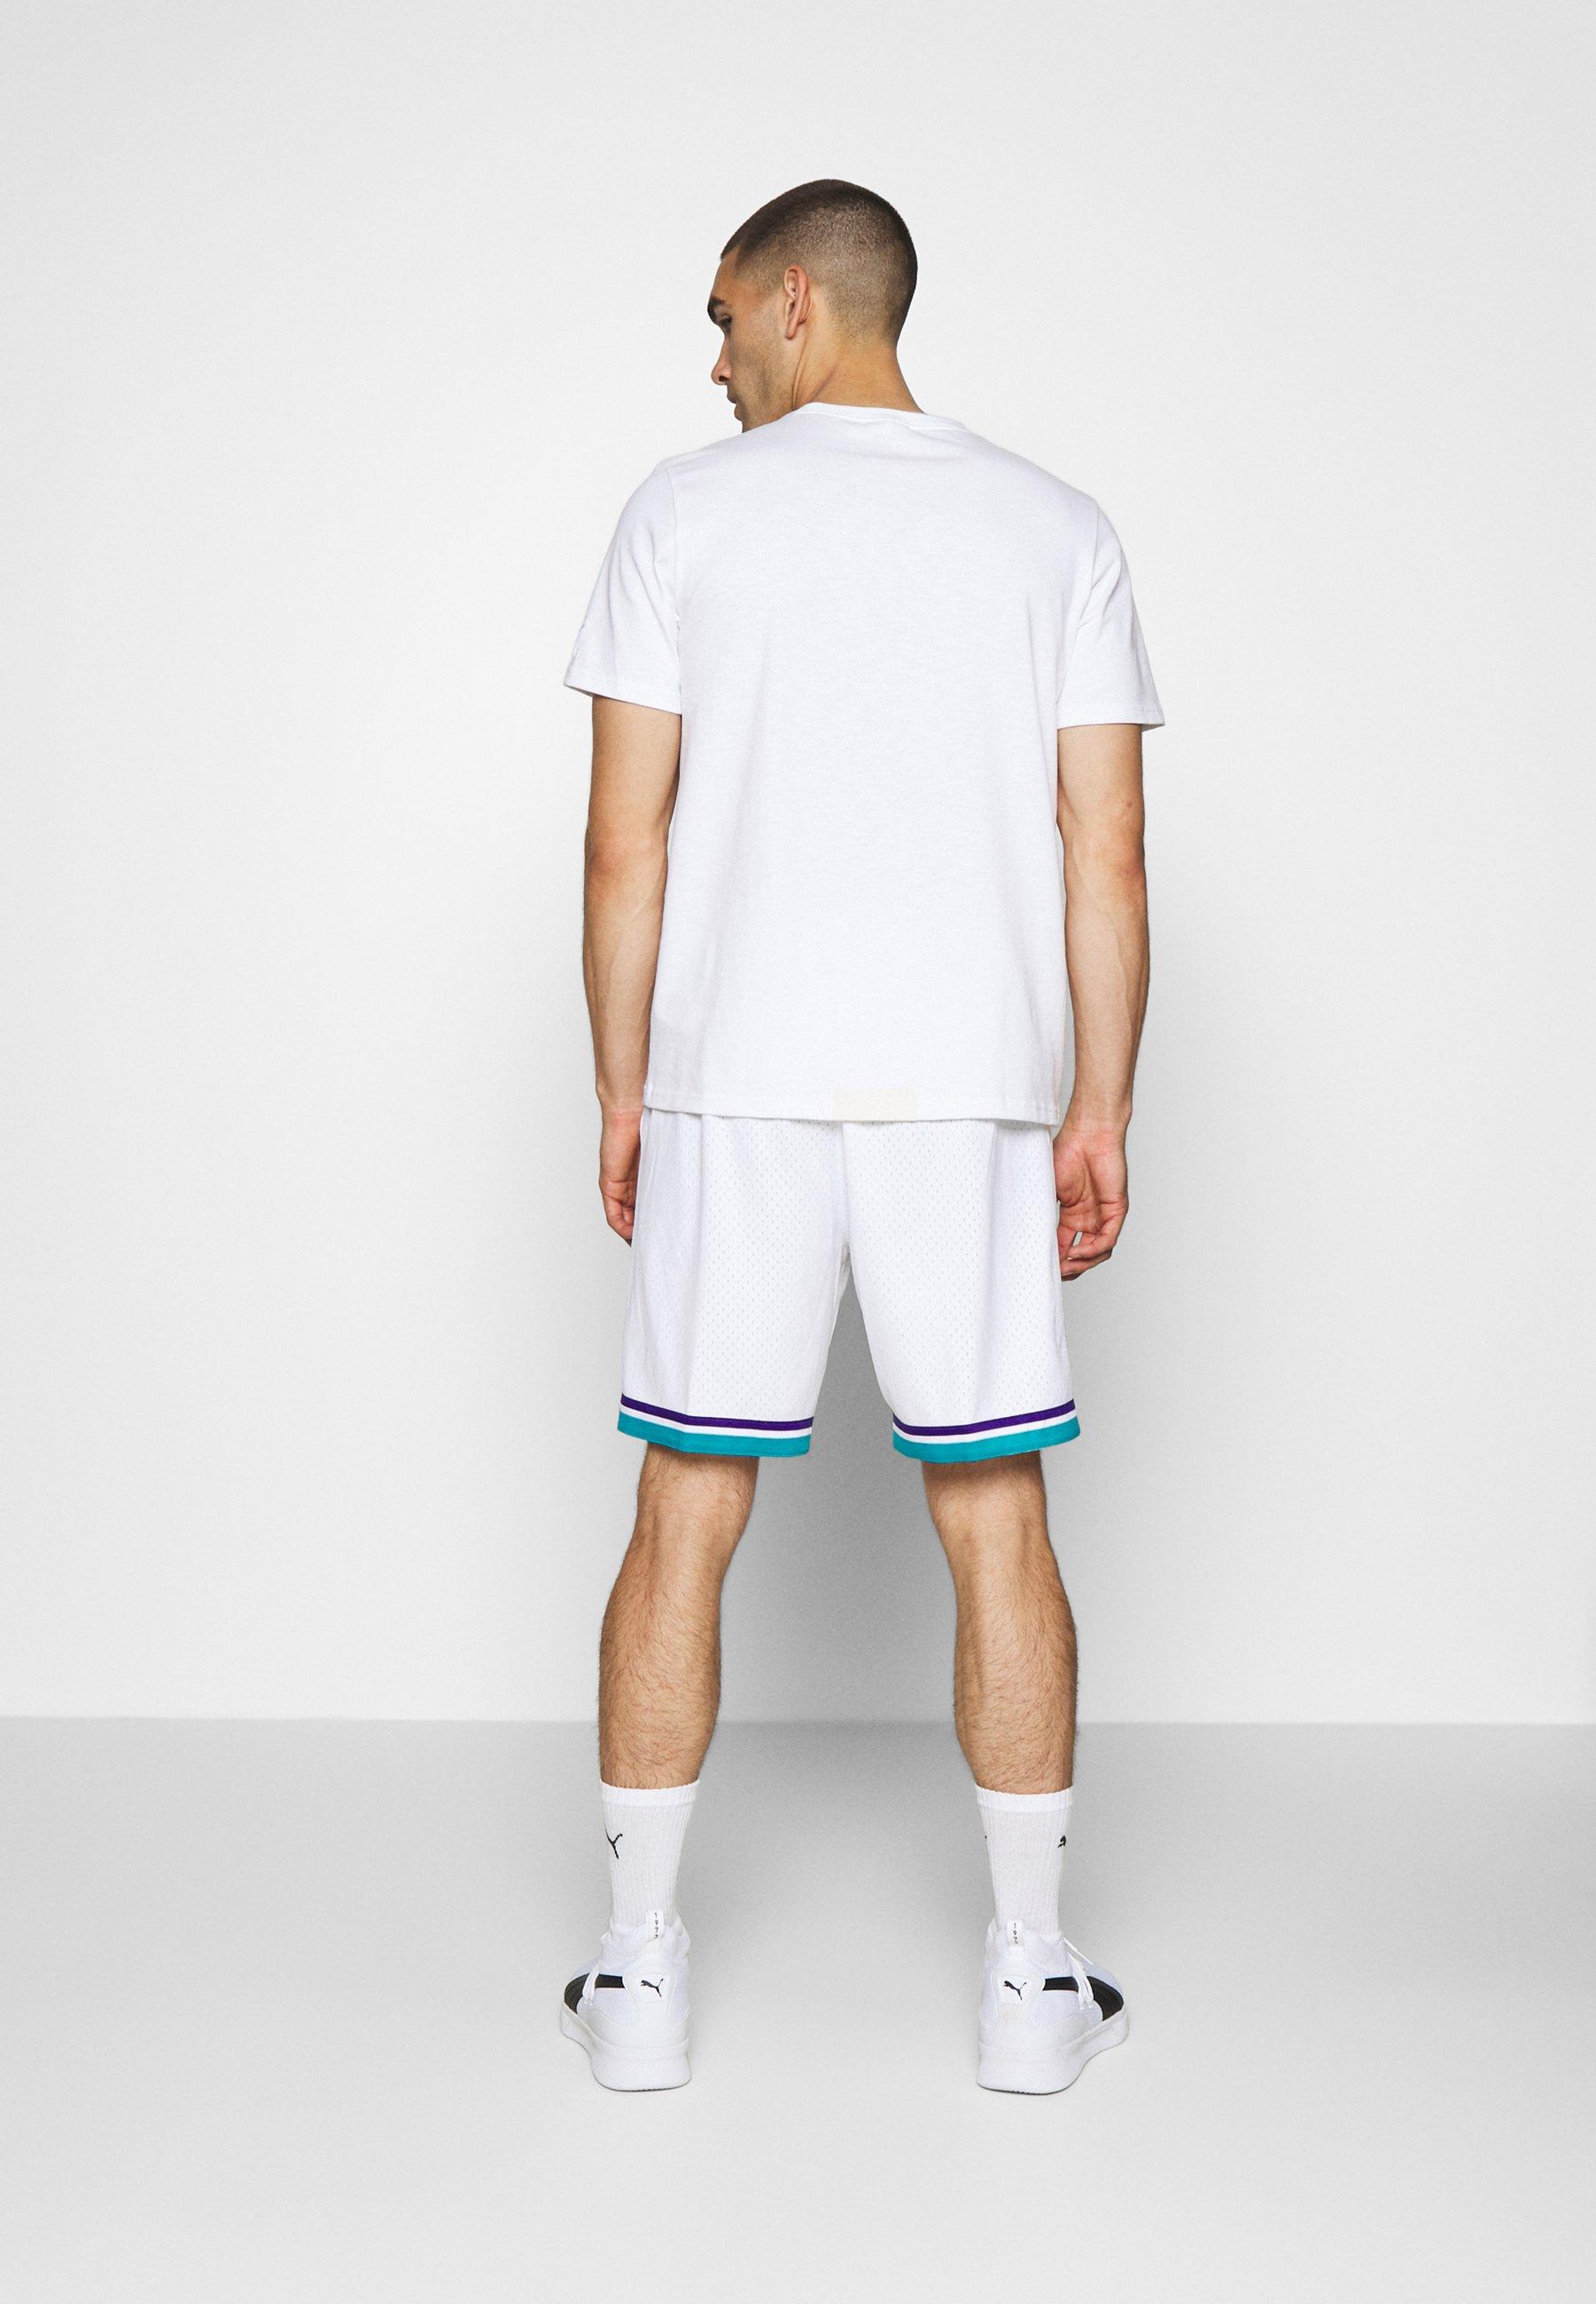 Mitchell & Ness SWINGMAN SHORTS 1992-93 HORNETS - Short de sport - white/teal